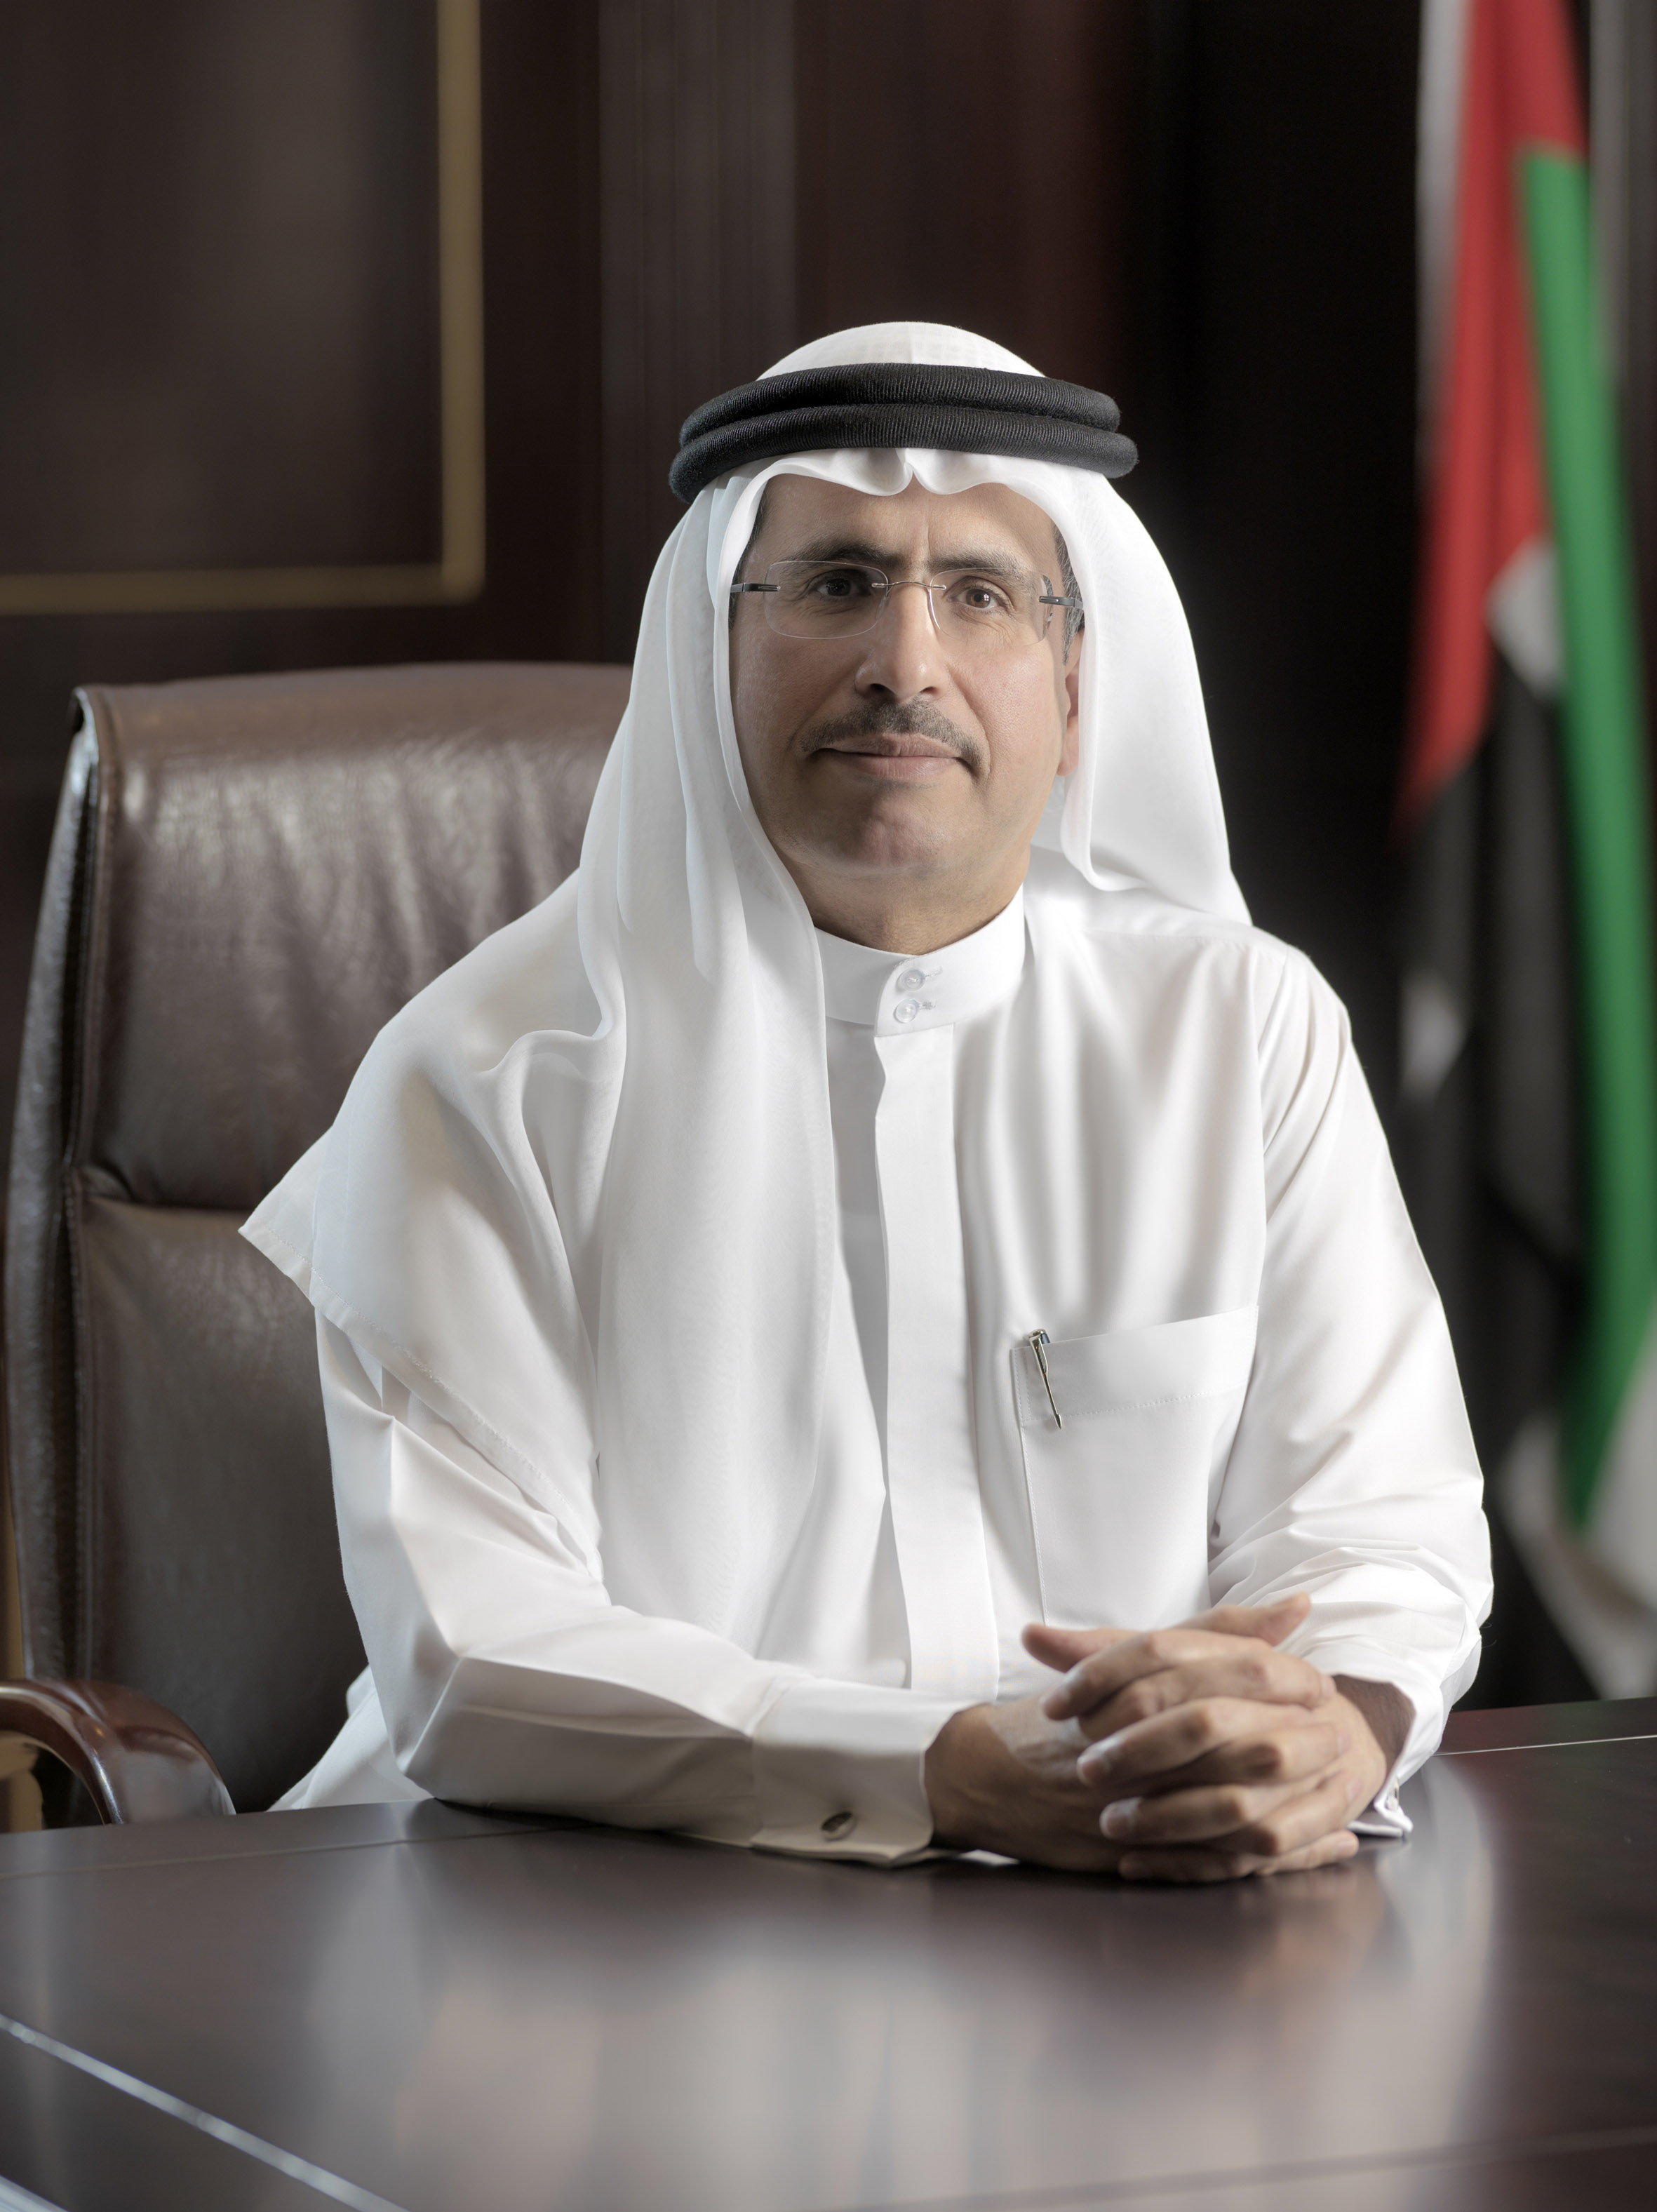 Dubai's DEWA to embrace artificial intelligence for digital utility